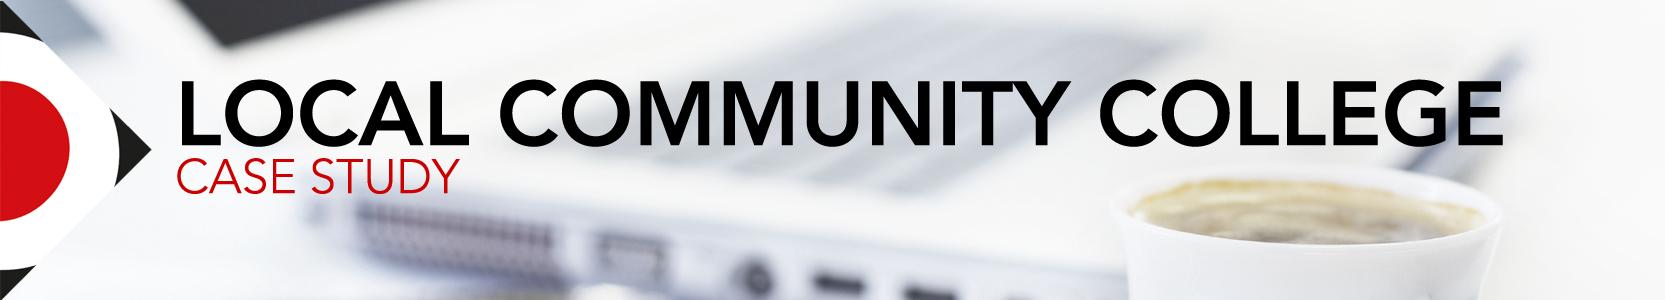 local community college case study